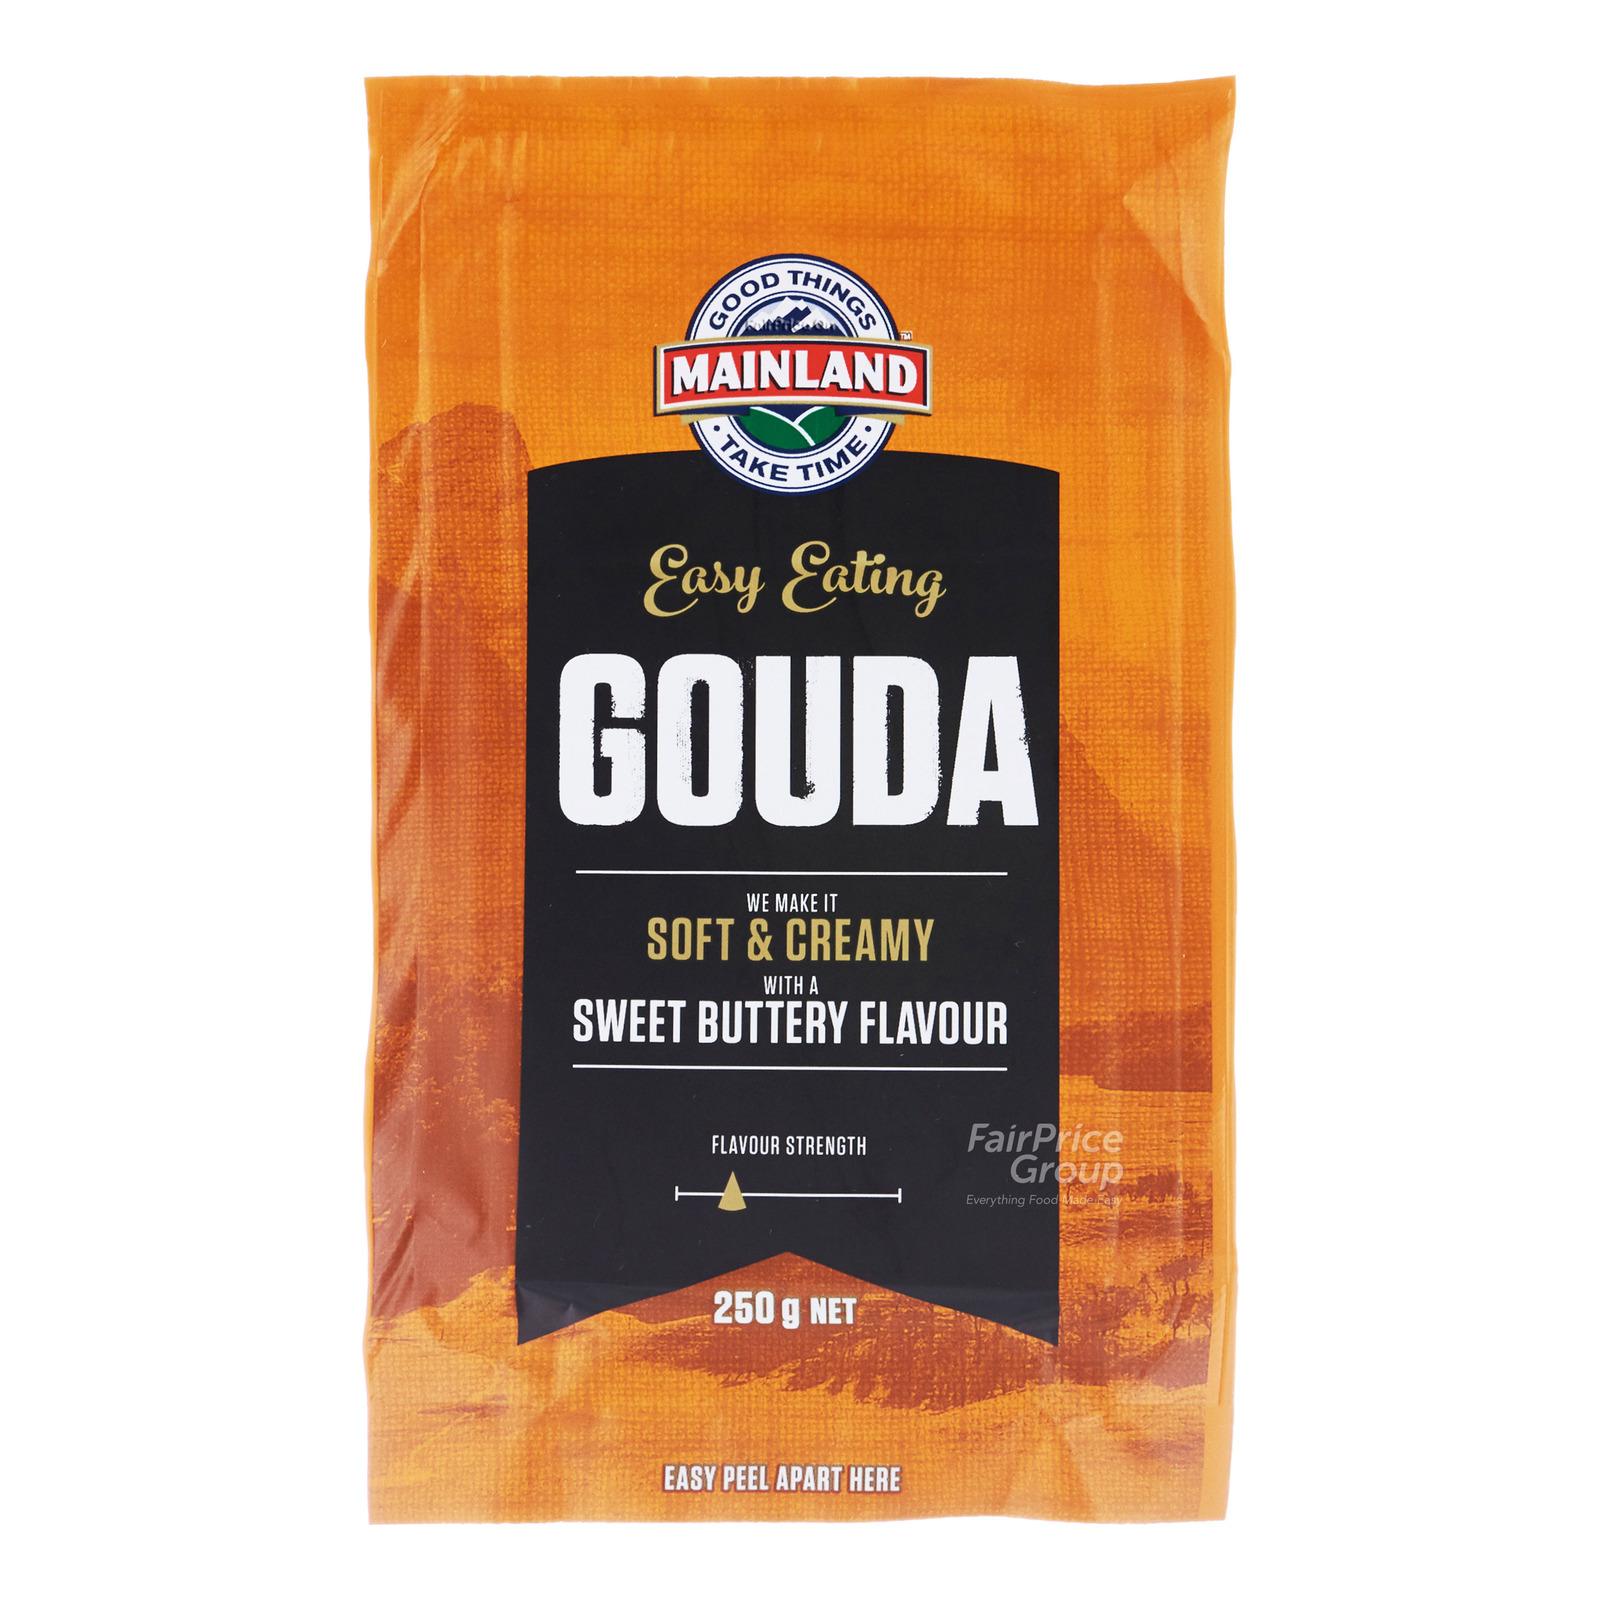 Mainland Block Cheese - Gouda (Soft & Creamy)